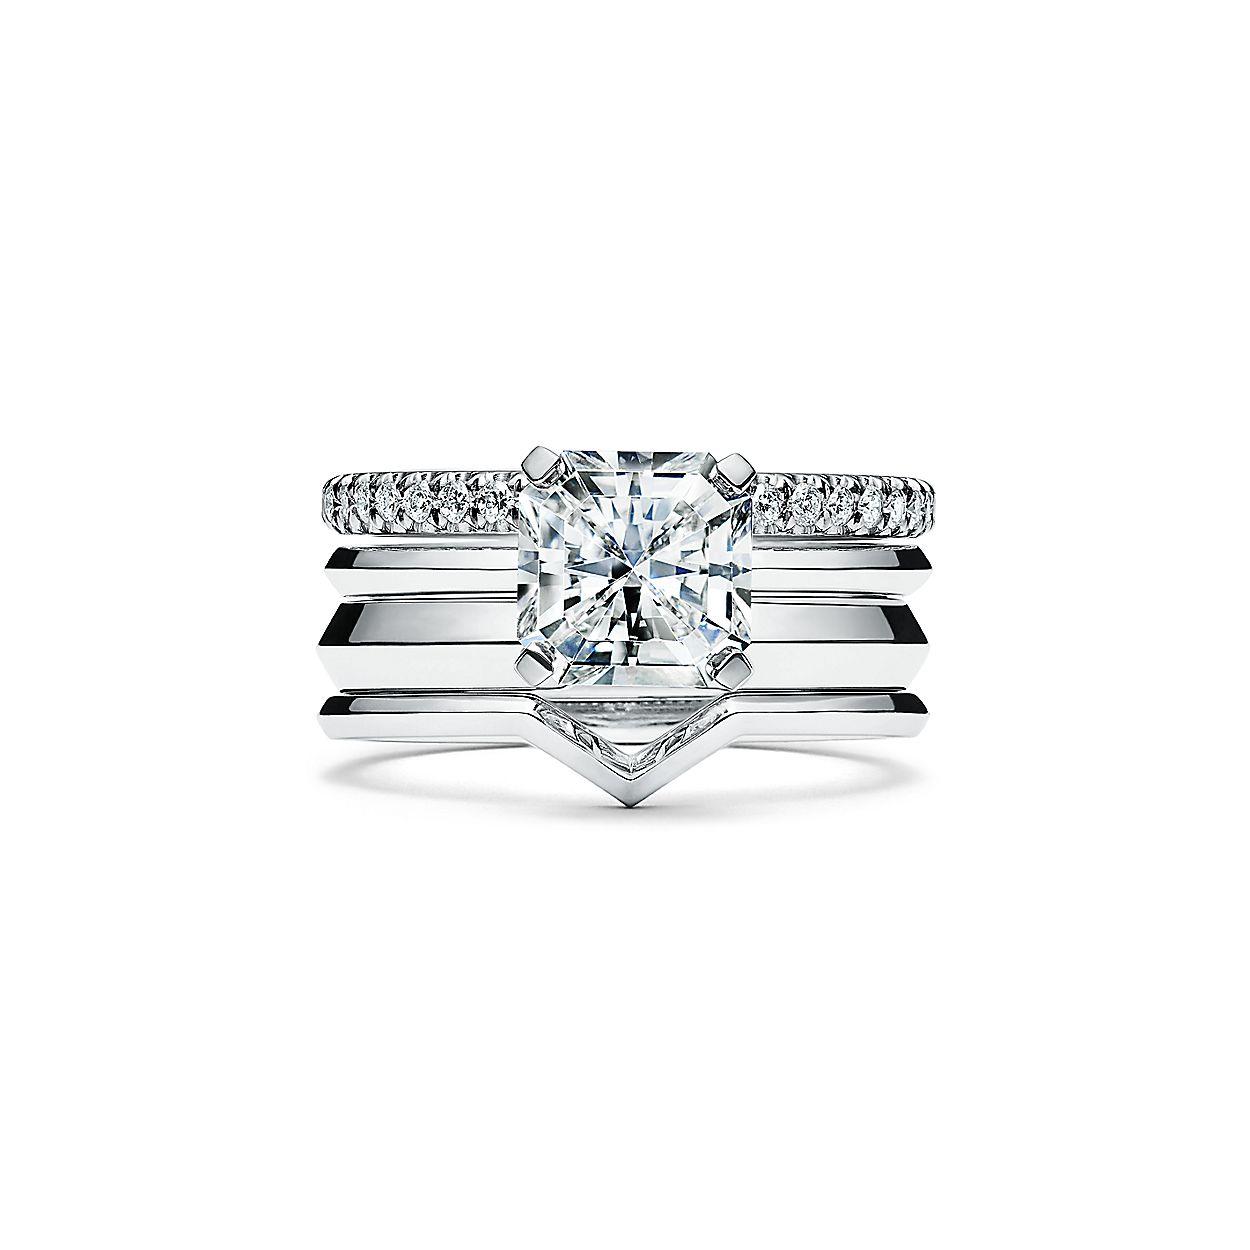 a06df9692 Tiffany True Engagement Ring with a Tiffany True Diamond in Platinum